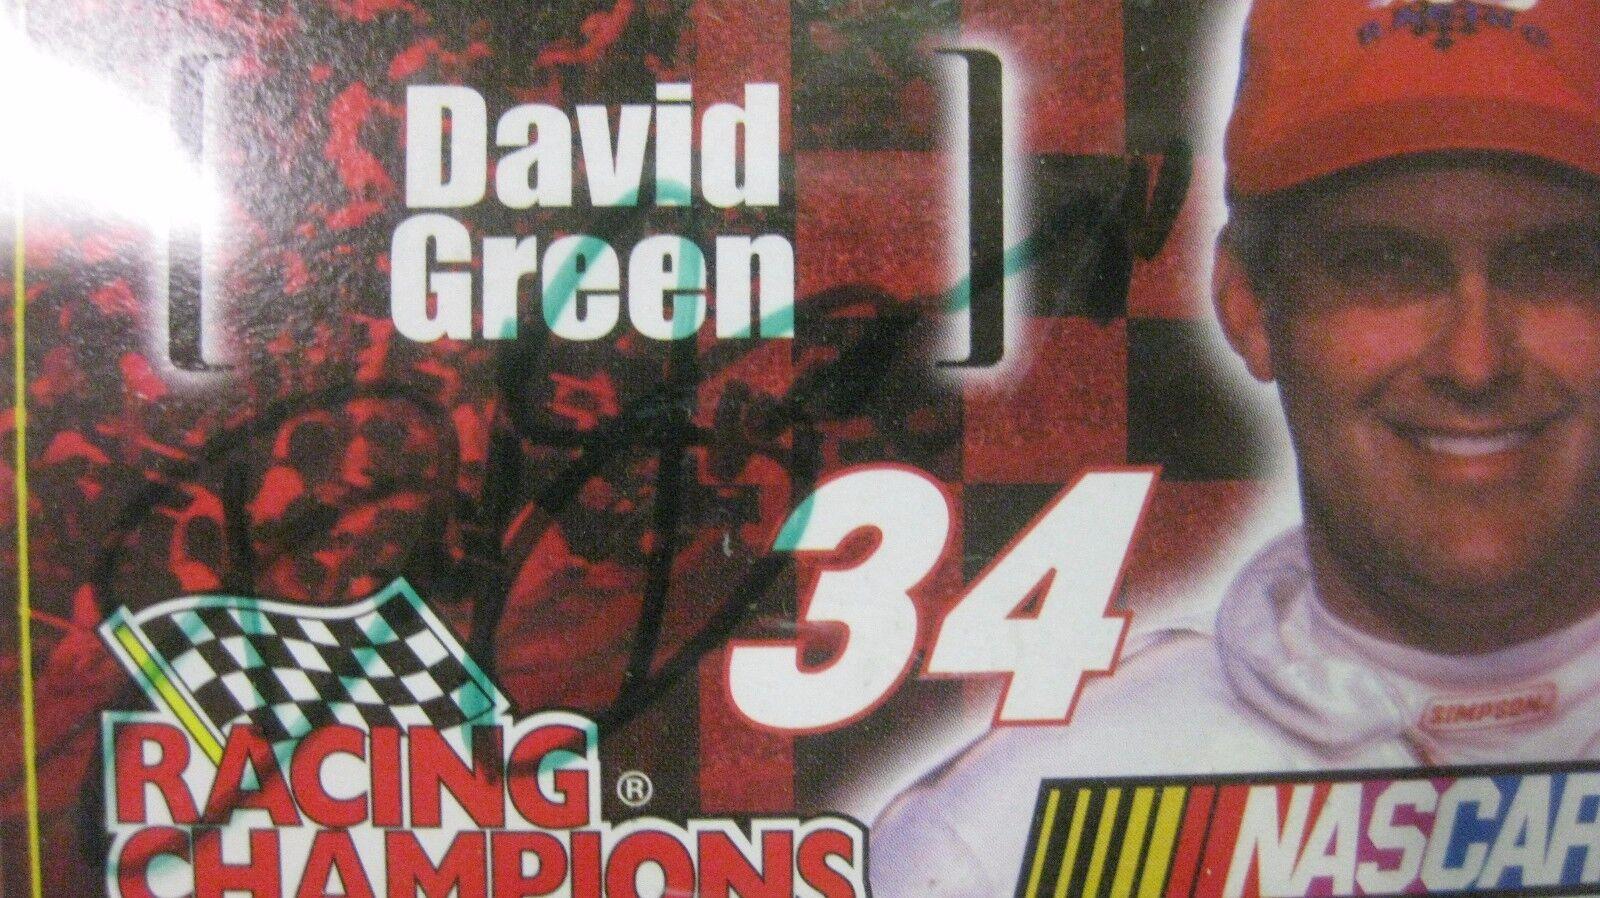 Raro Nascar Persecución Persecución Persecución The Race David green Firmado Chevy 1 64 de Metal Nuevo 9652c0